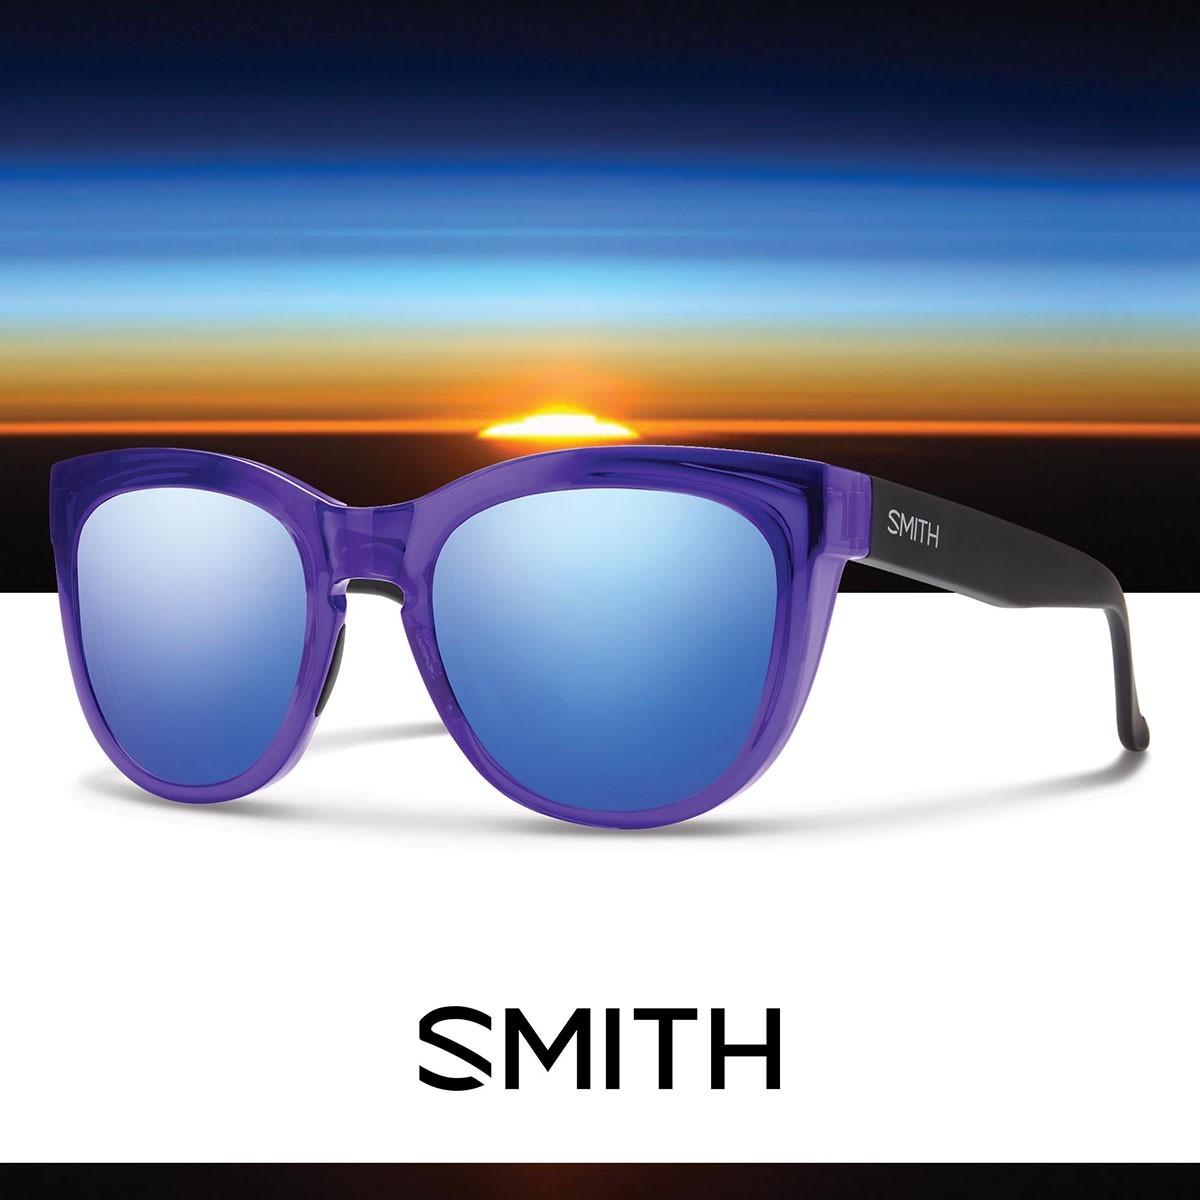 SMITH SIDNEY vintage black - Изображение - AQUAMATRIX